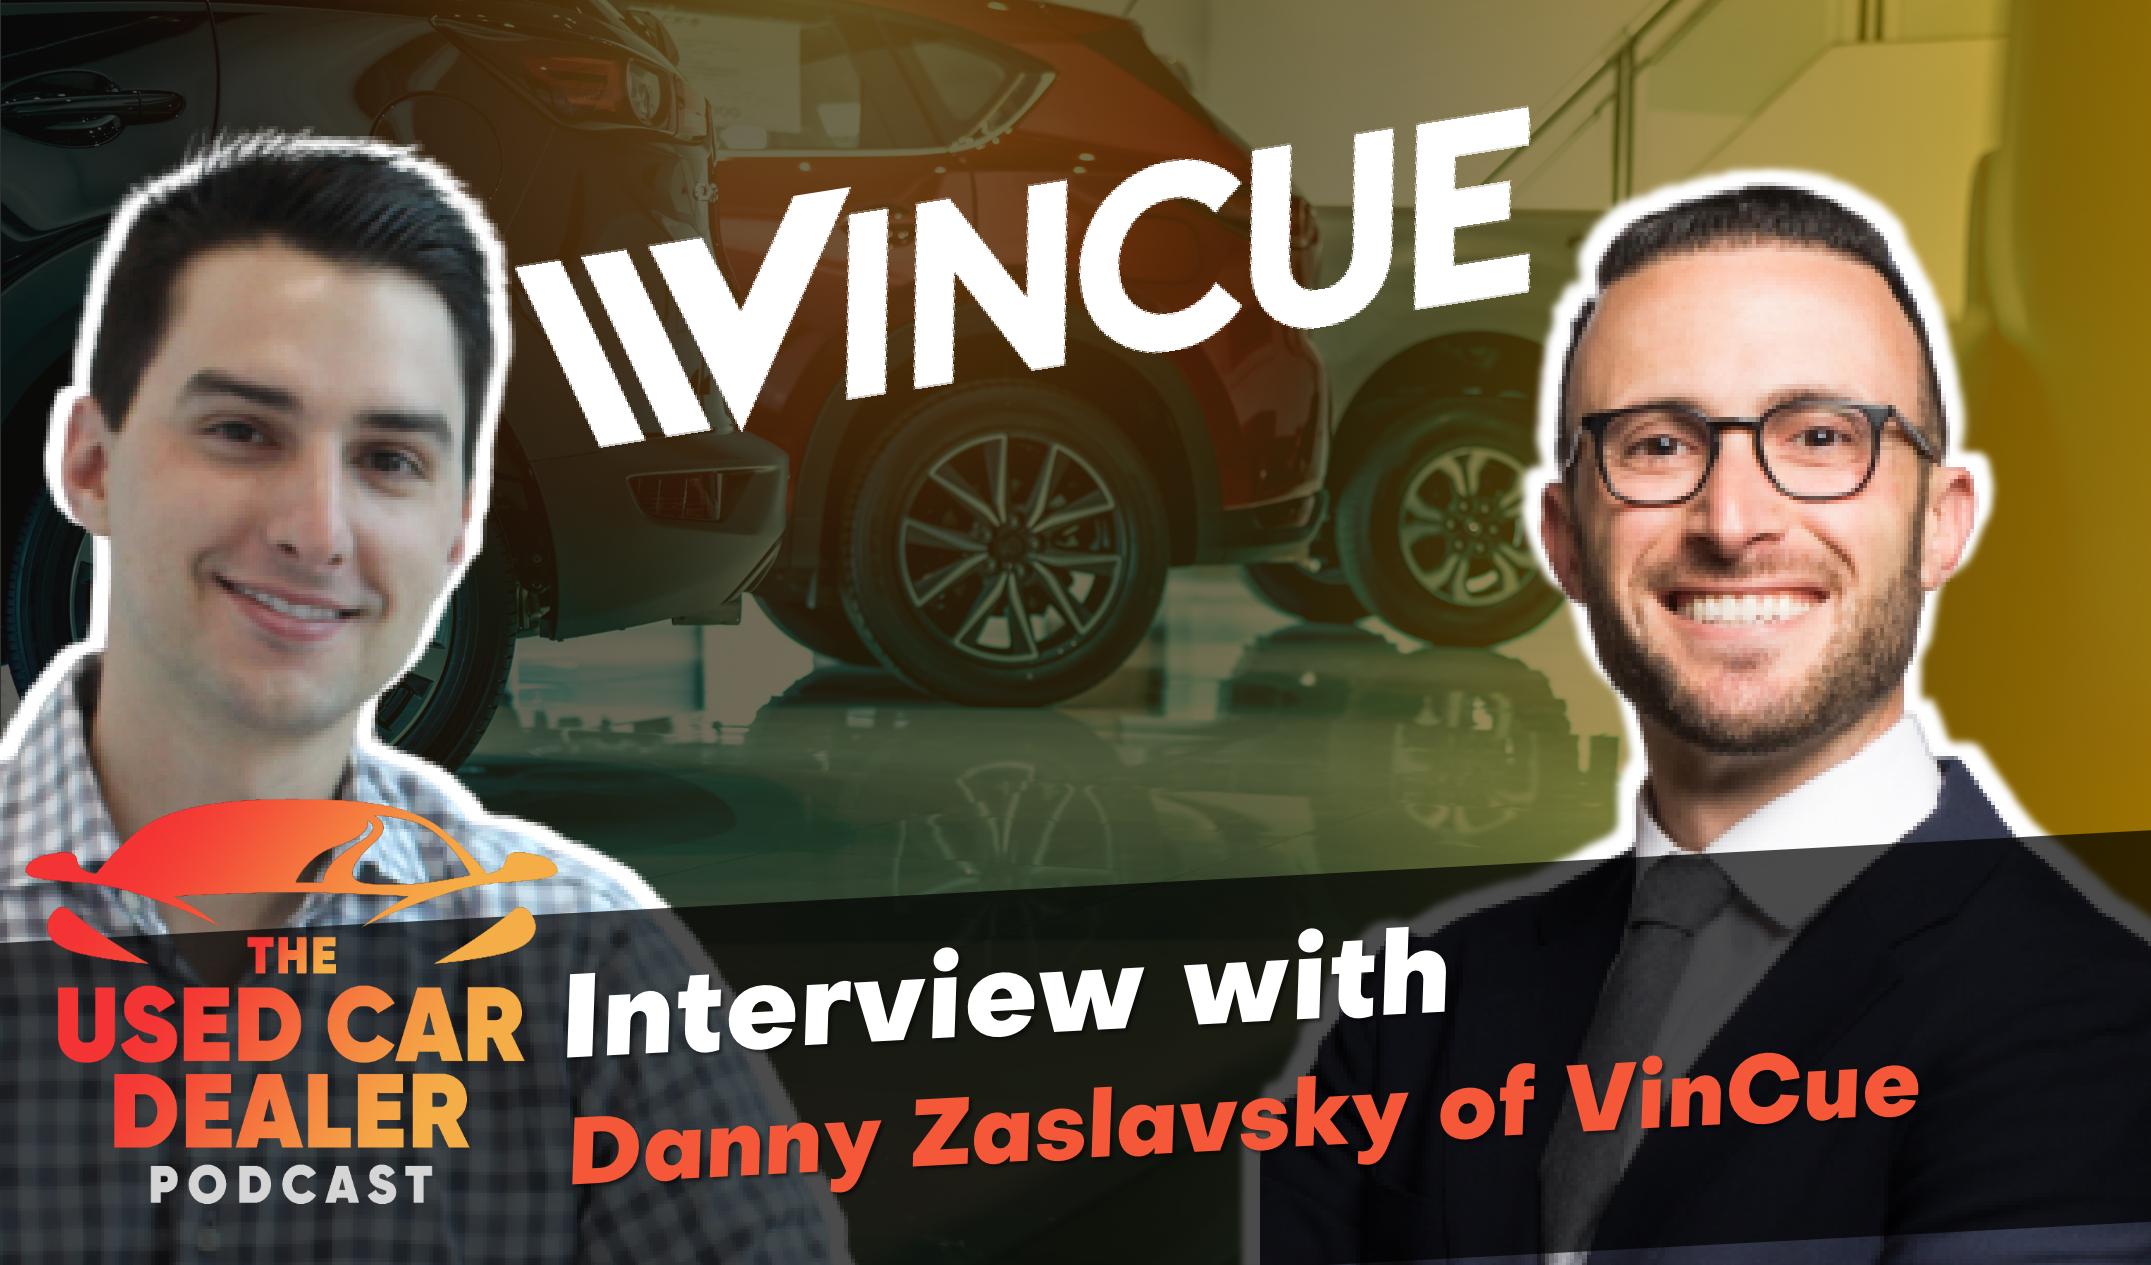 Inventory Management with Danny Zaslavsky of VinCue